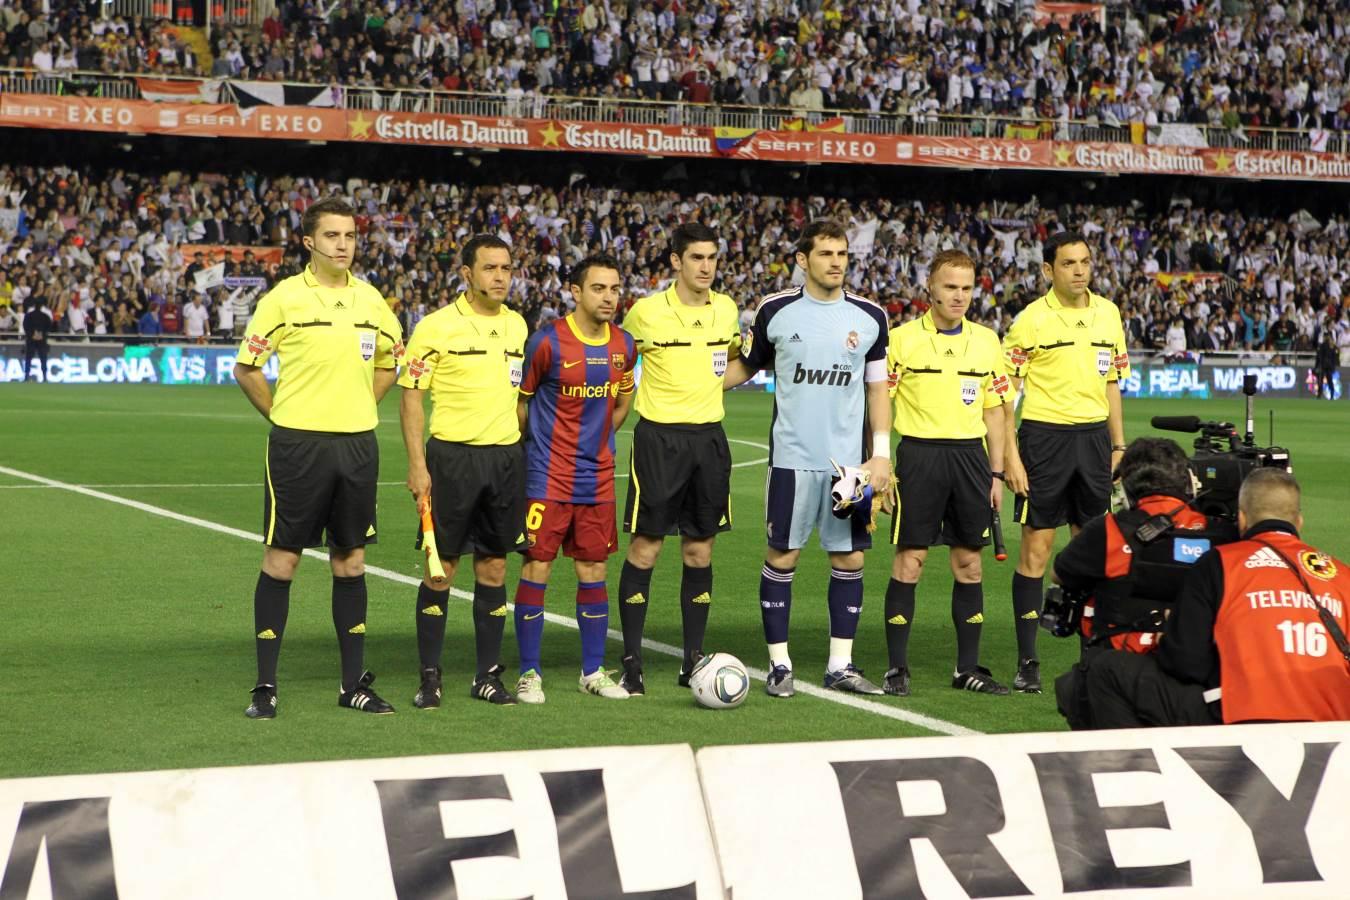 Liga hiszpa144ska, gol24, real madryt, fc barcelona, cristiano ronaldo